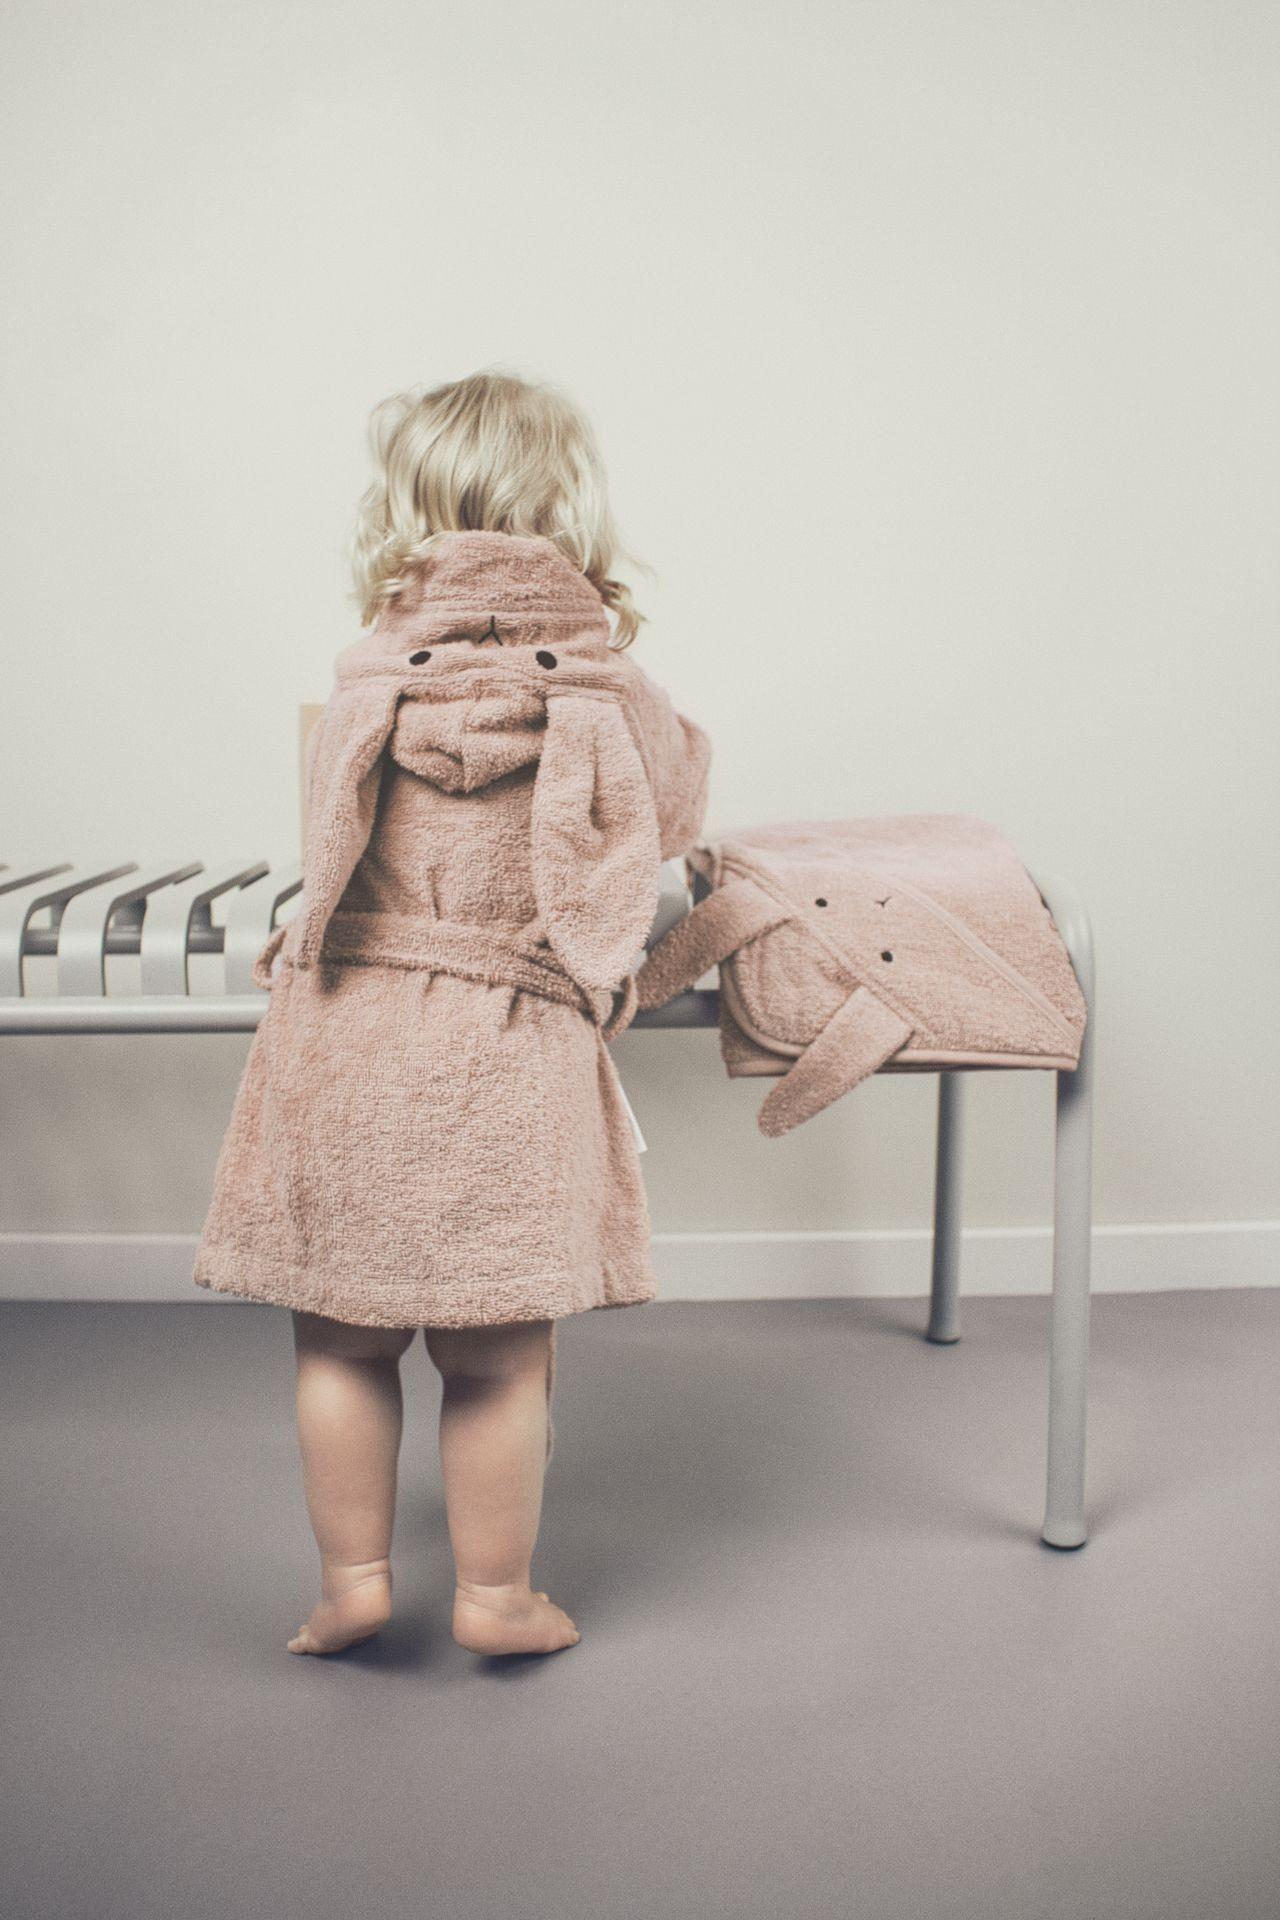 Liewood Bademantel Lily Hase Rose Kapuzenhandtuch Baby Mantel Bademantel